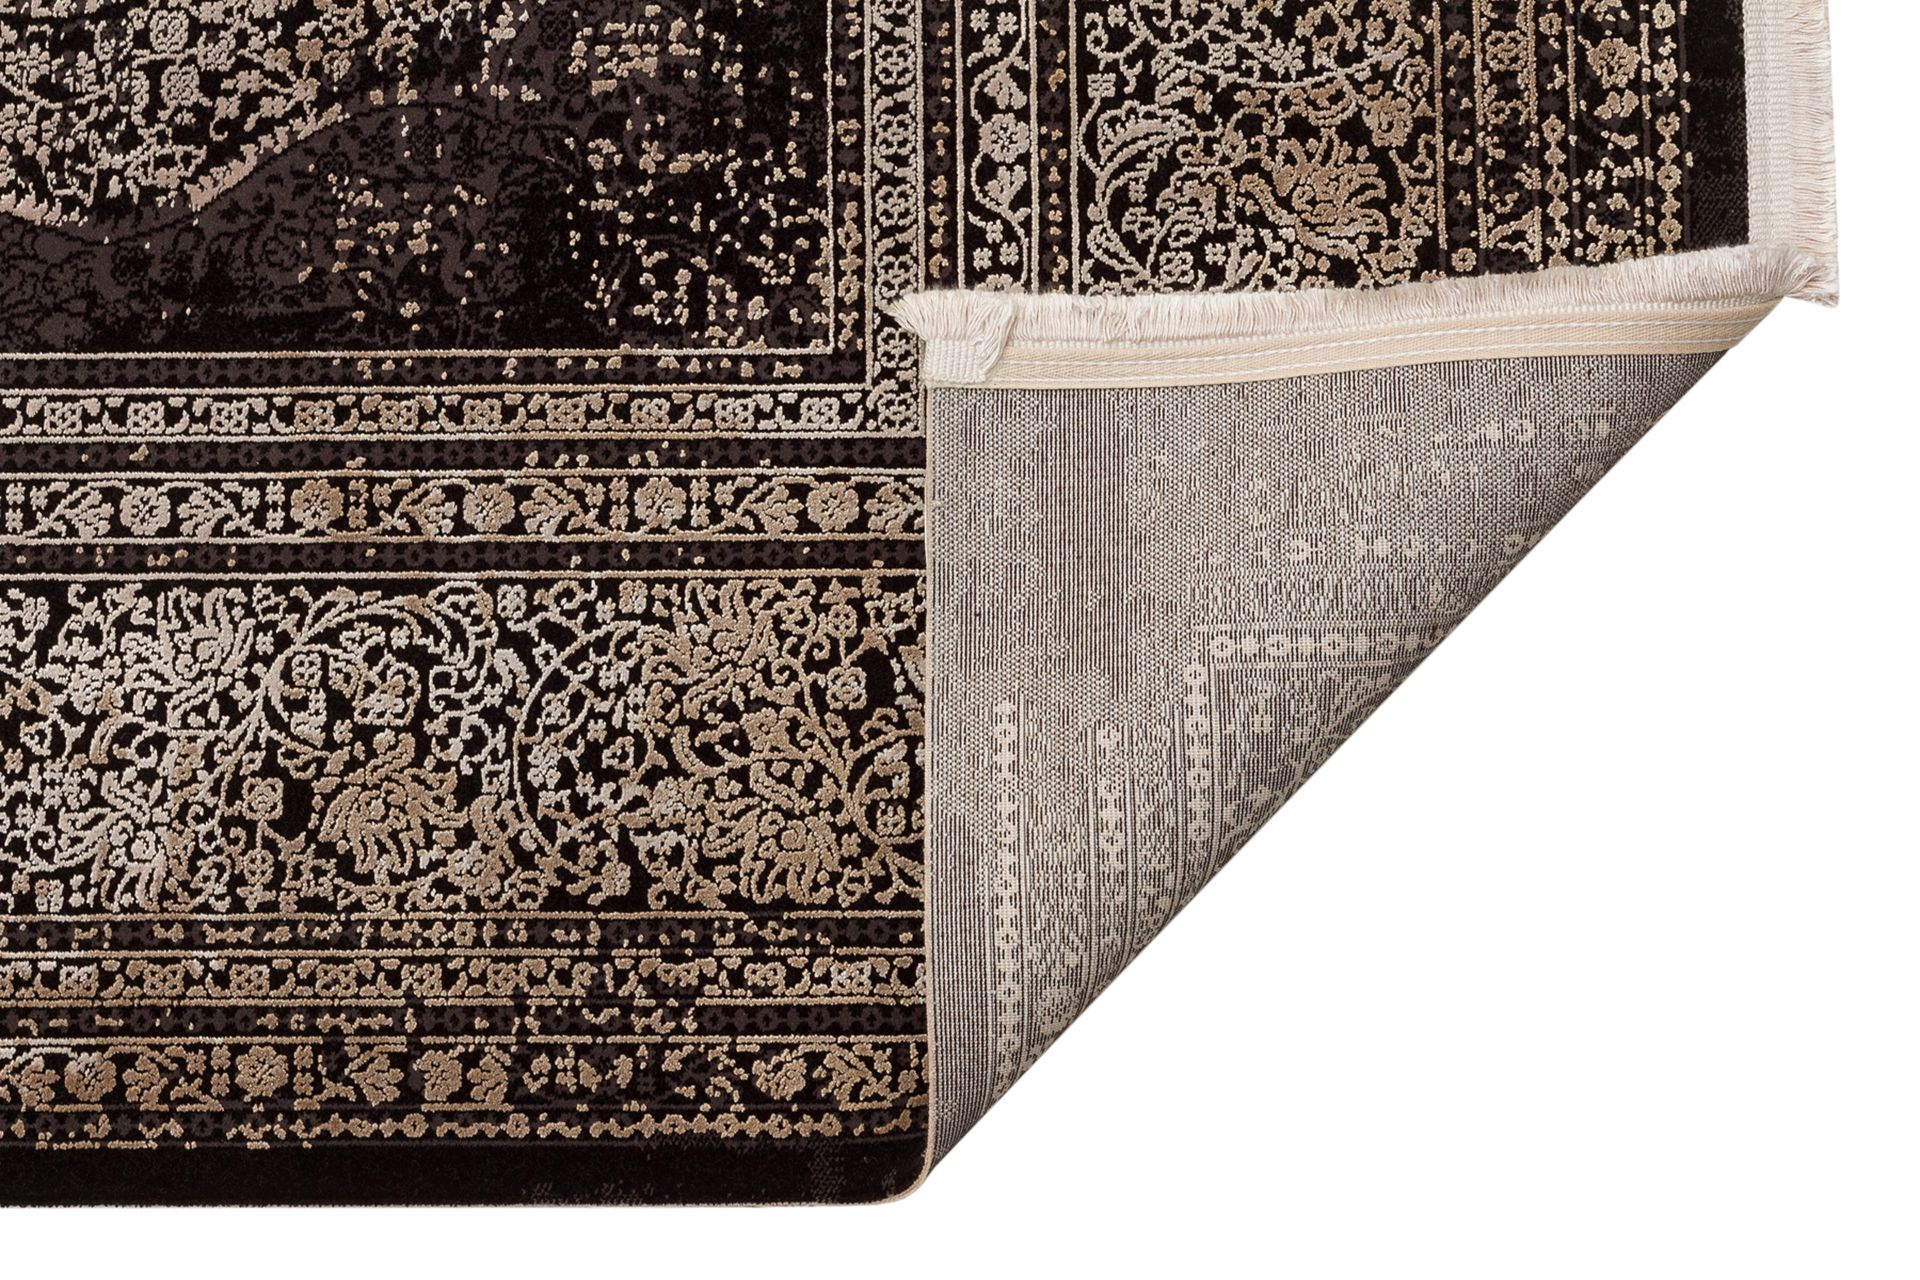 ANADOLU AD 01 ANTRASİT BEJ KLASİK DESENLİ SALON HALISI 200x290